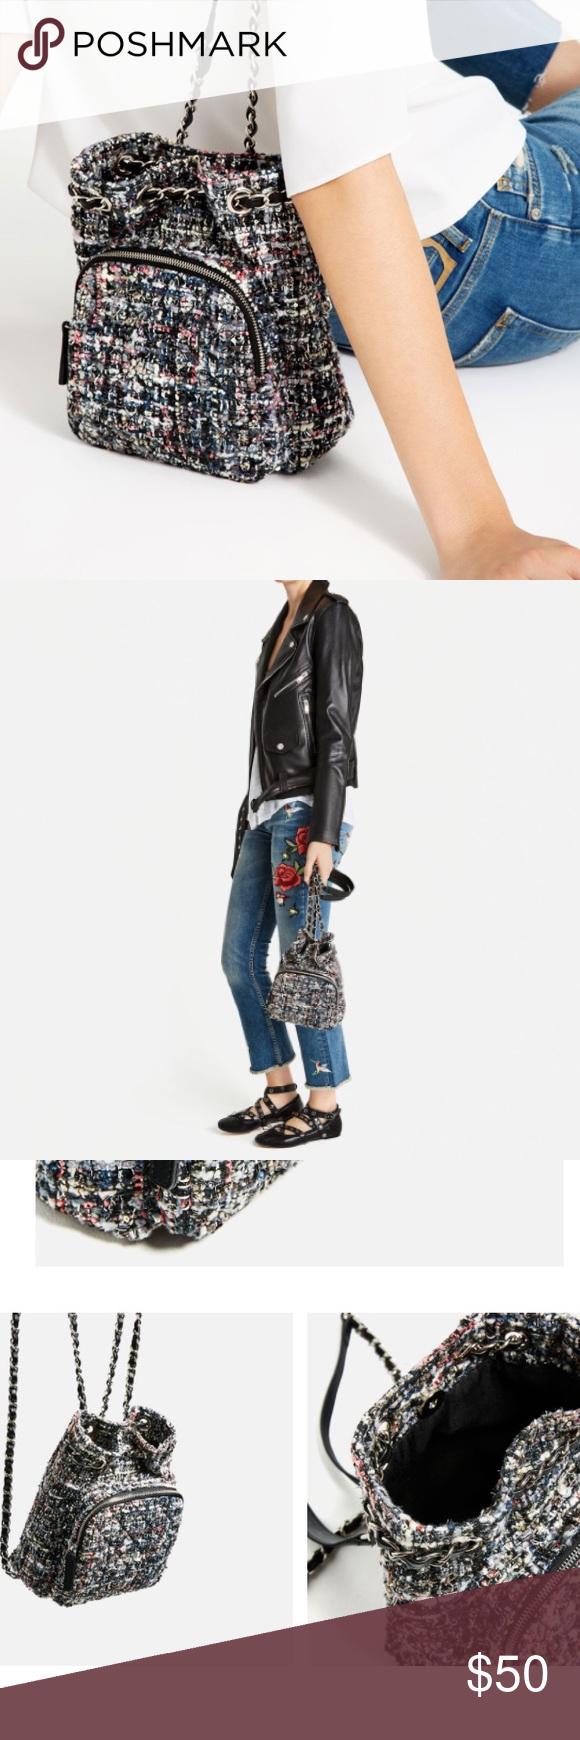 Zara tweed chain backpack Used once Zara Bags Backpacks